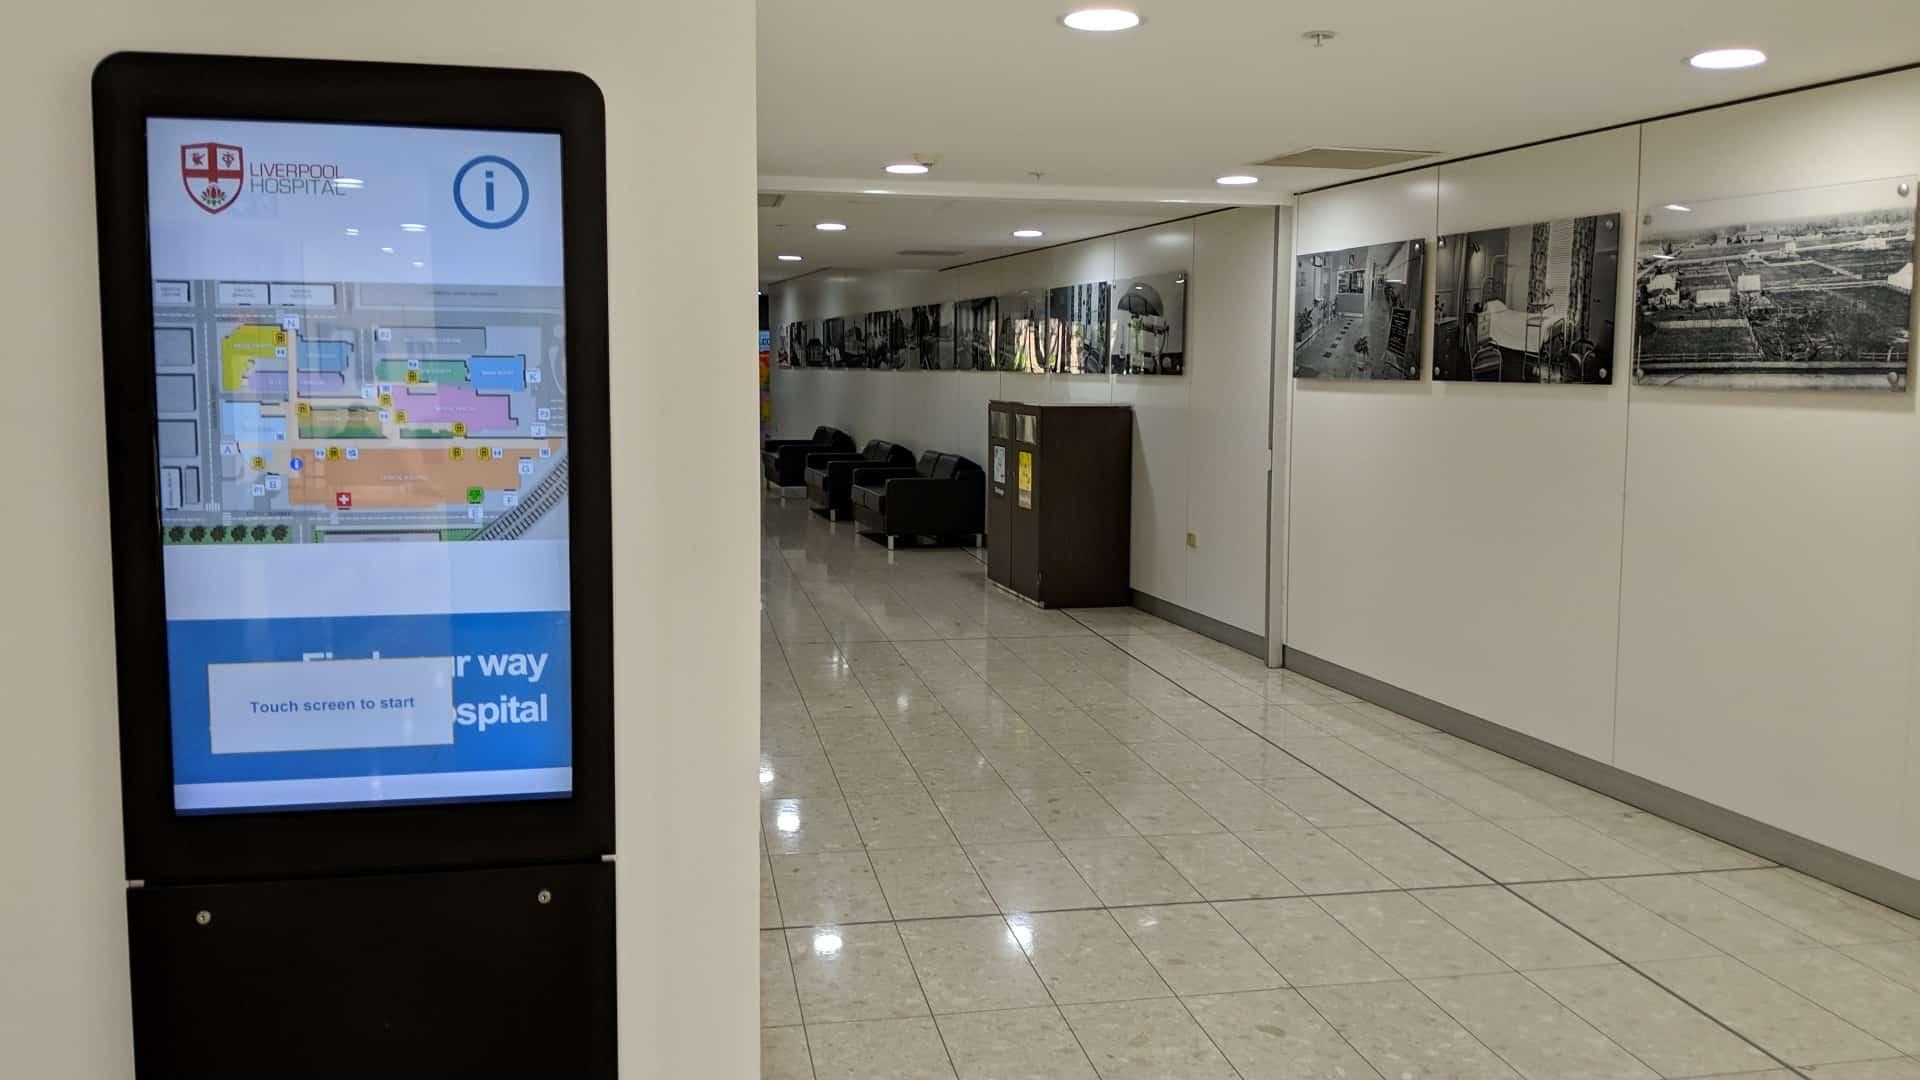 Advertise Me Digital Wayfinding Liverpool Hospital 8